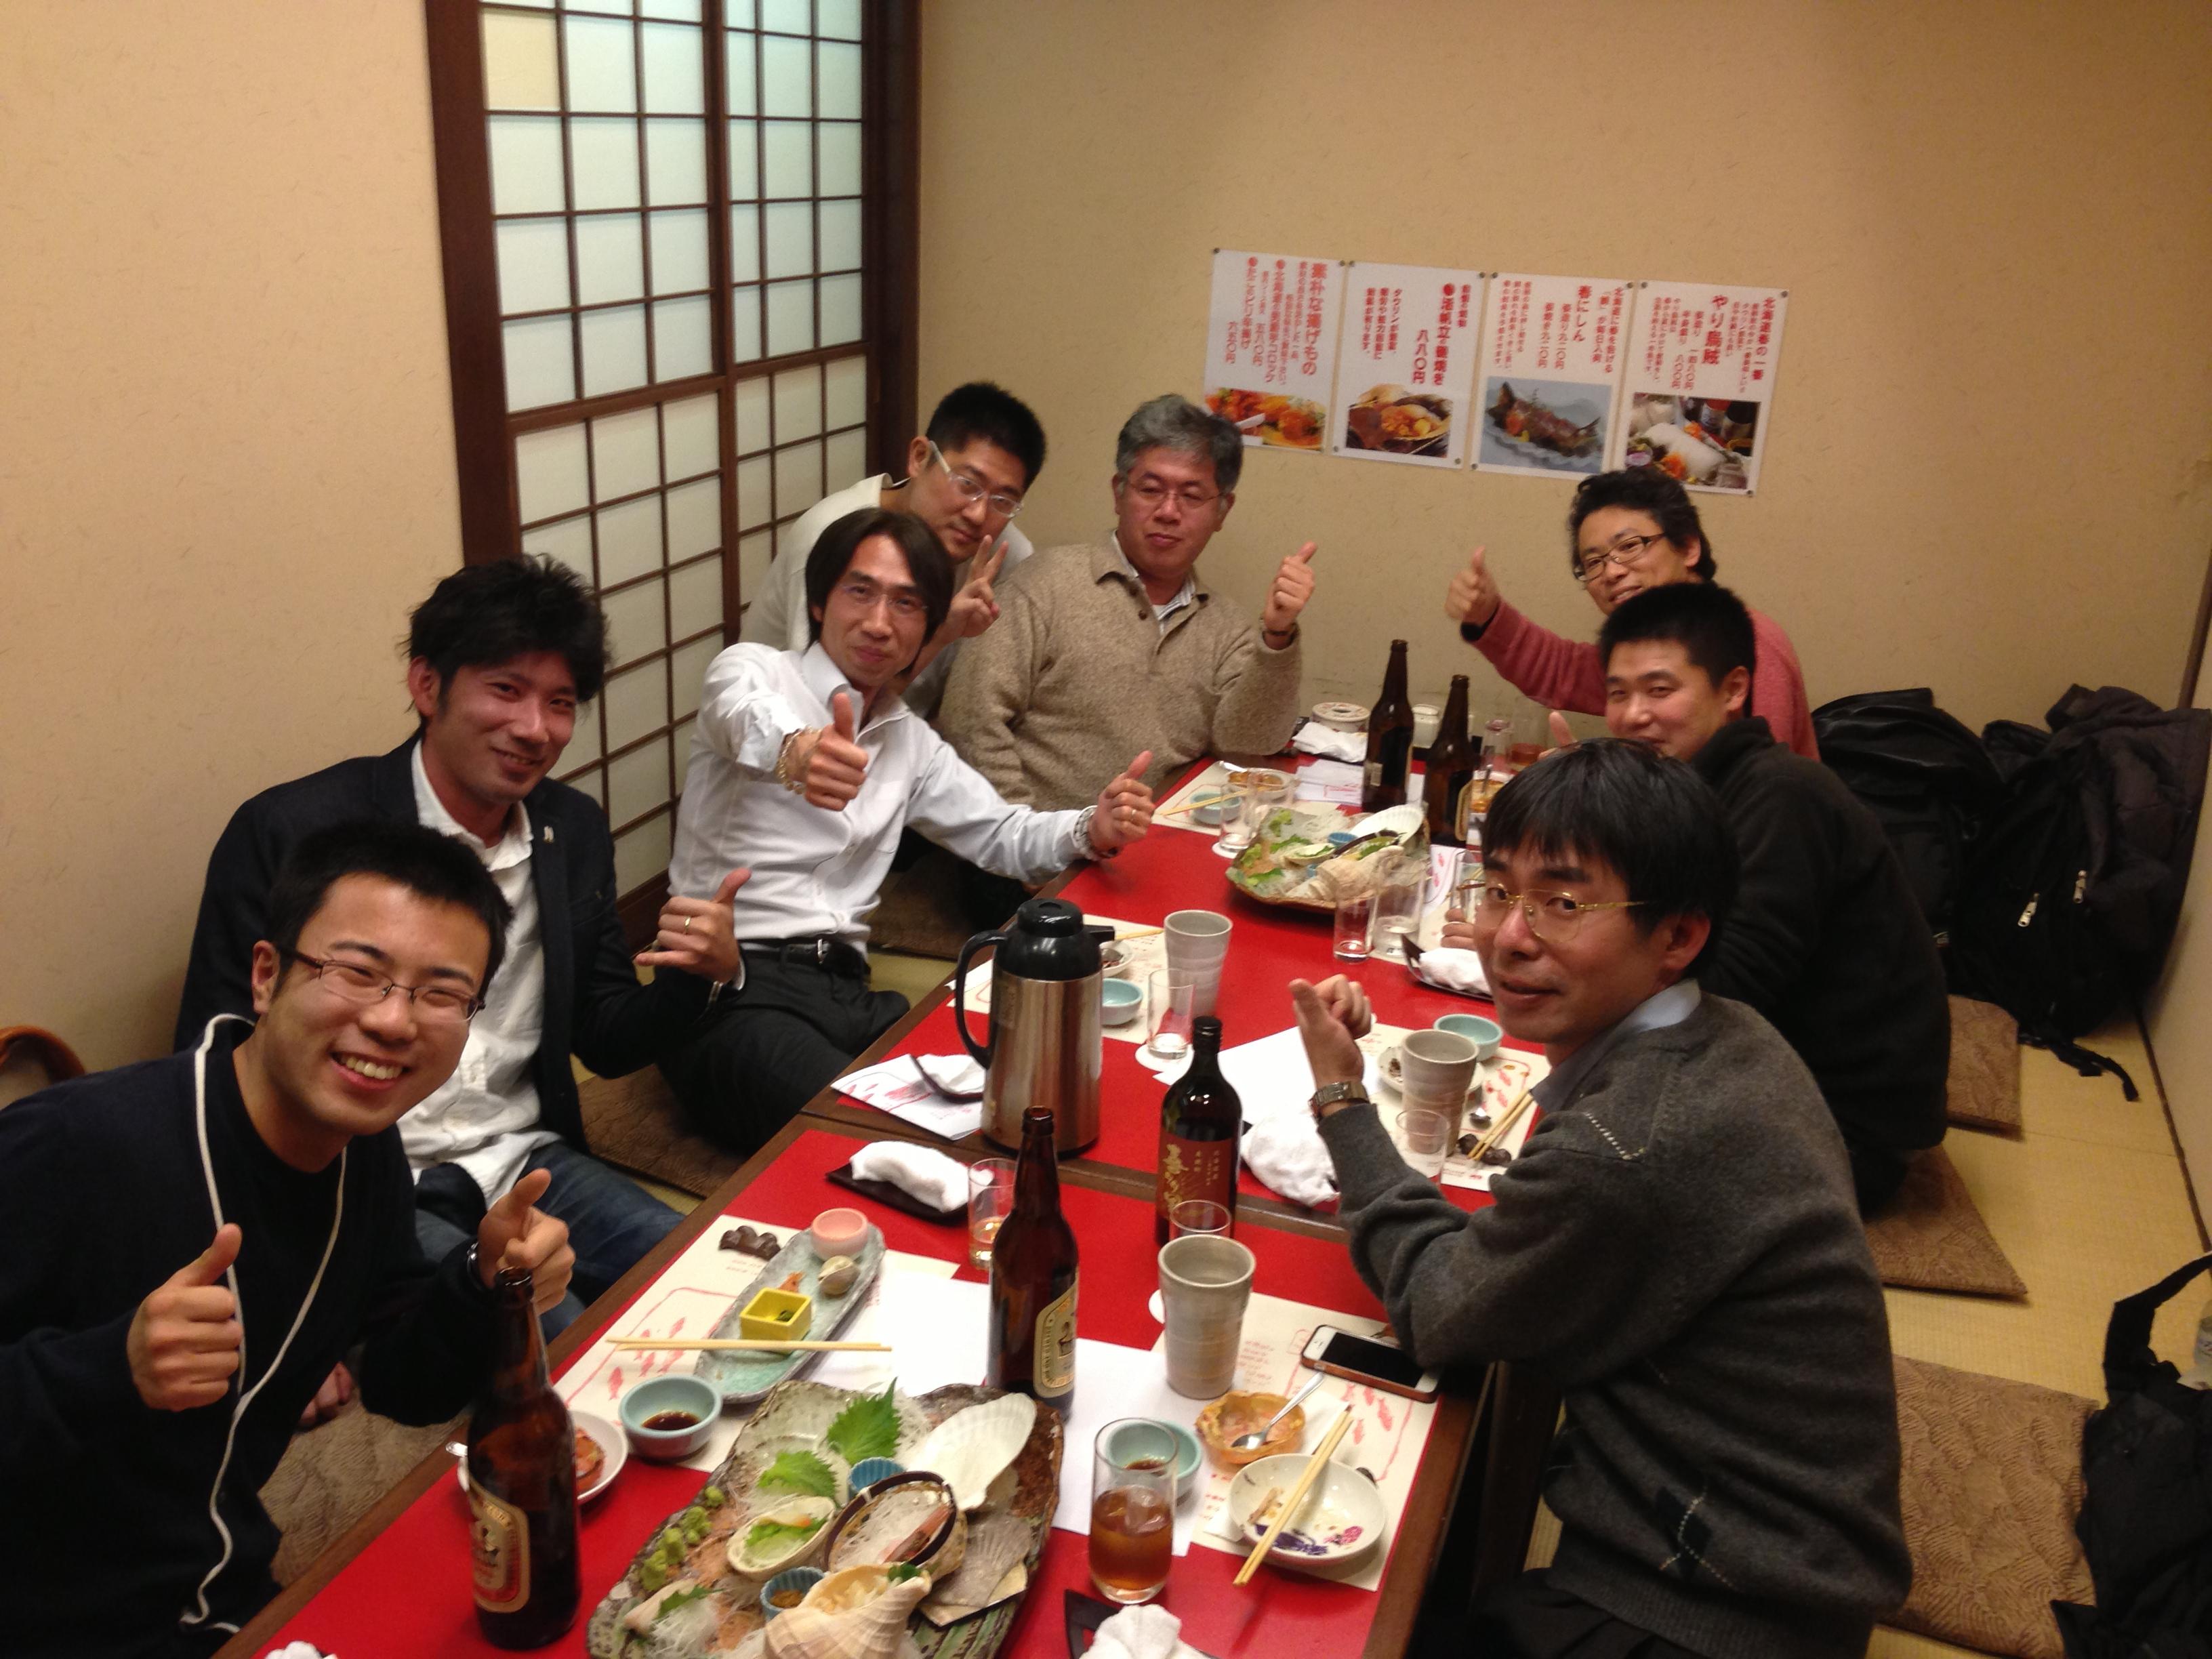 AWBM塾・体験セミナー後の懇親会(講師:三宅巧一)